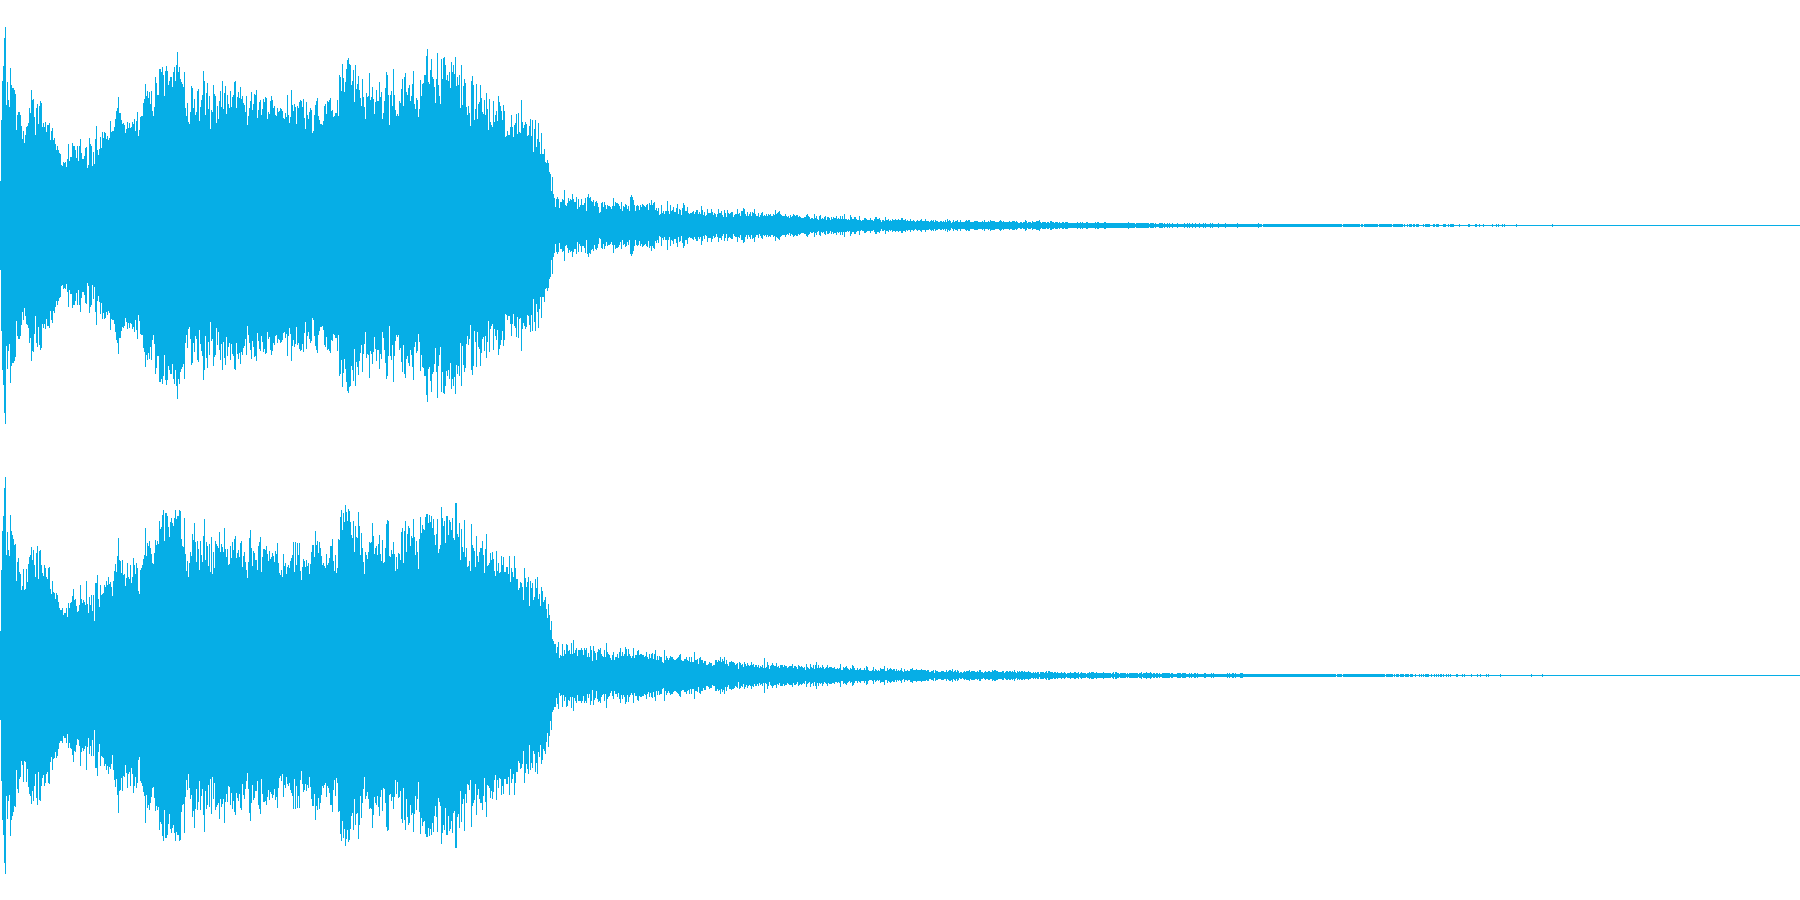 DJFX ヒットチャート発表前SE 19の再生済みの波形